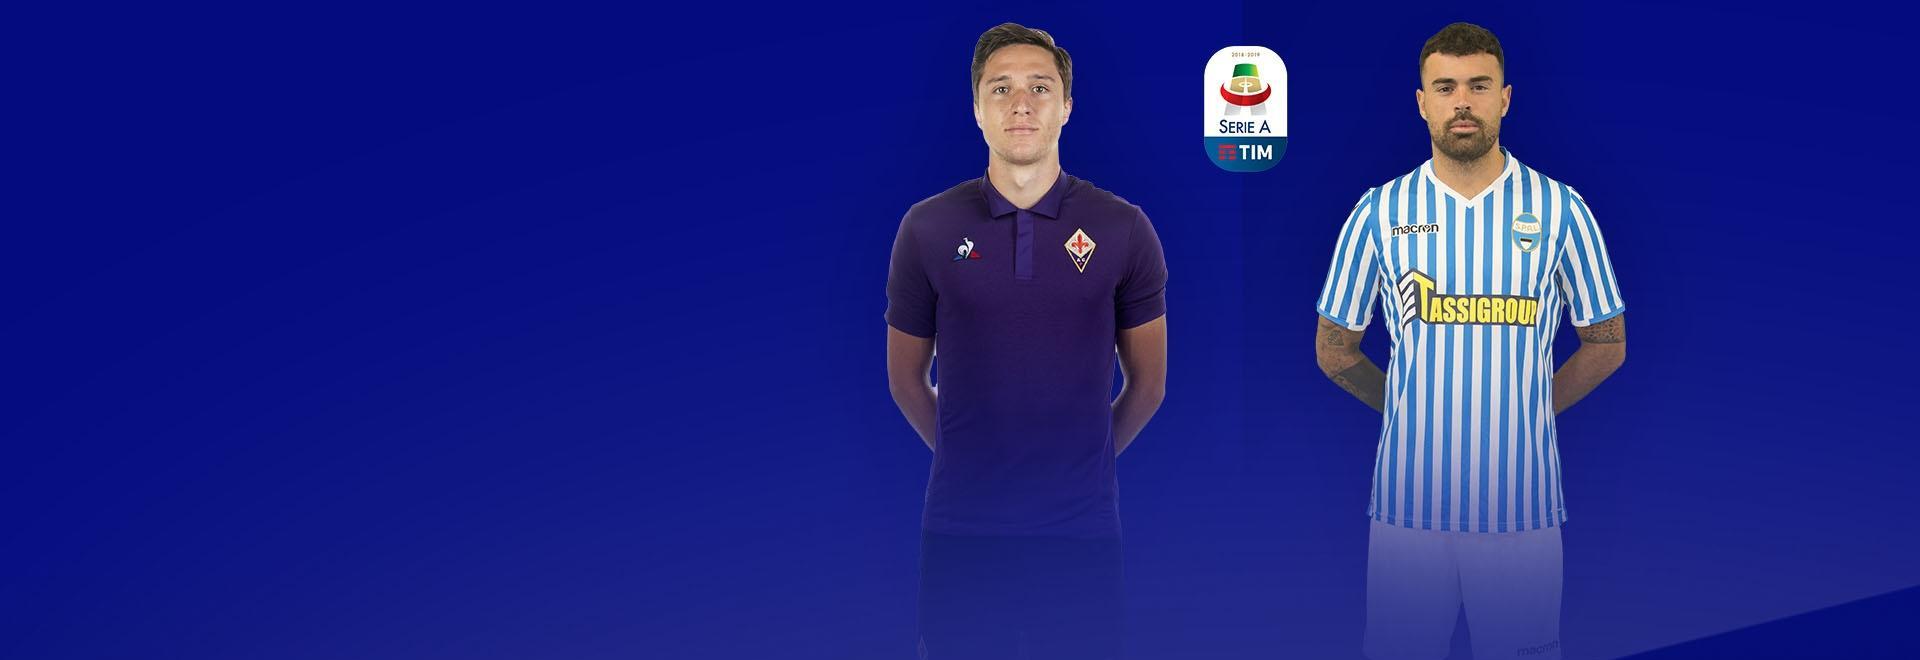 Fiorentina - Spal. 5a g.